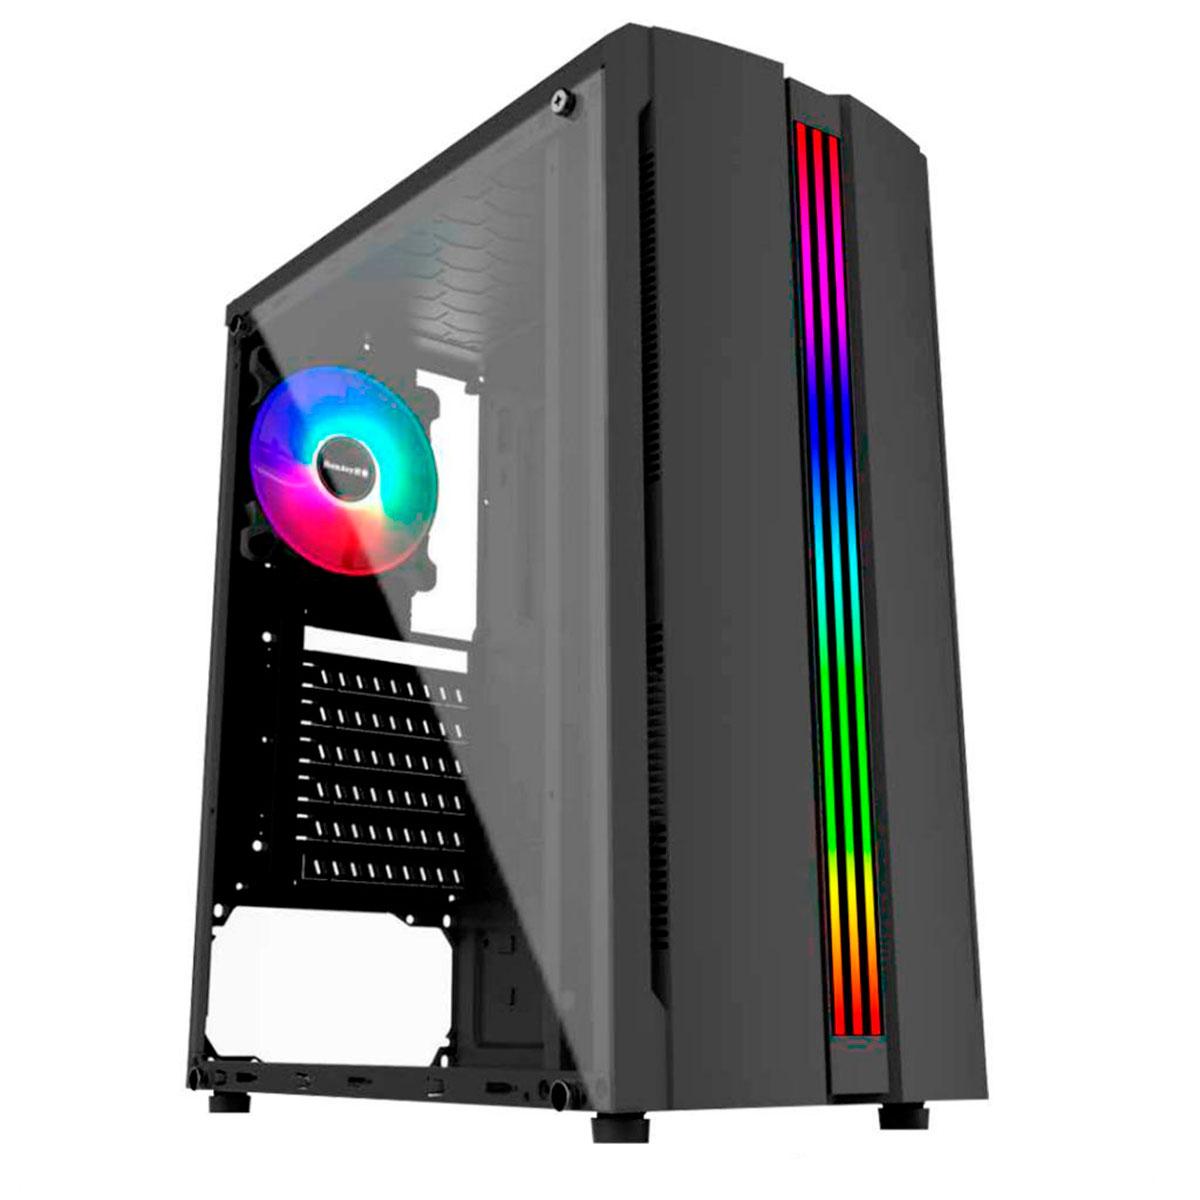 Gabinete Gamer Pixxo GF5522, RGB, ATX, USB 3.0 - Preto